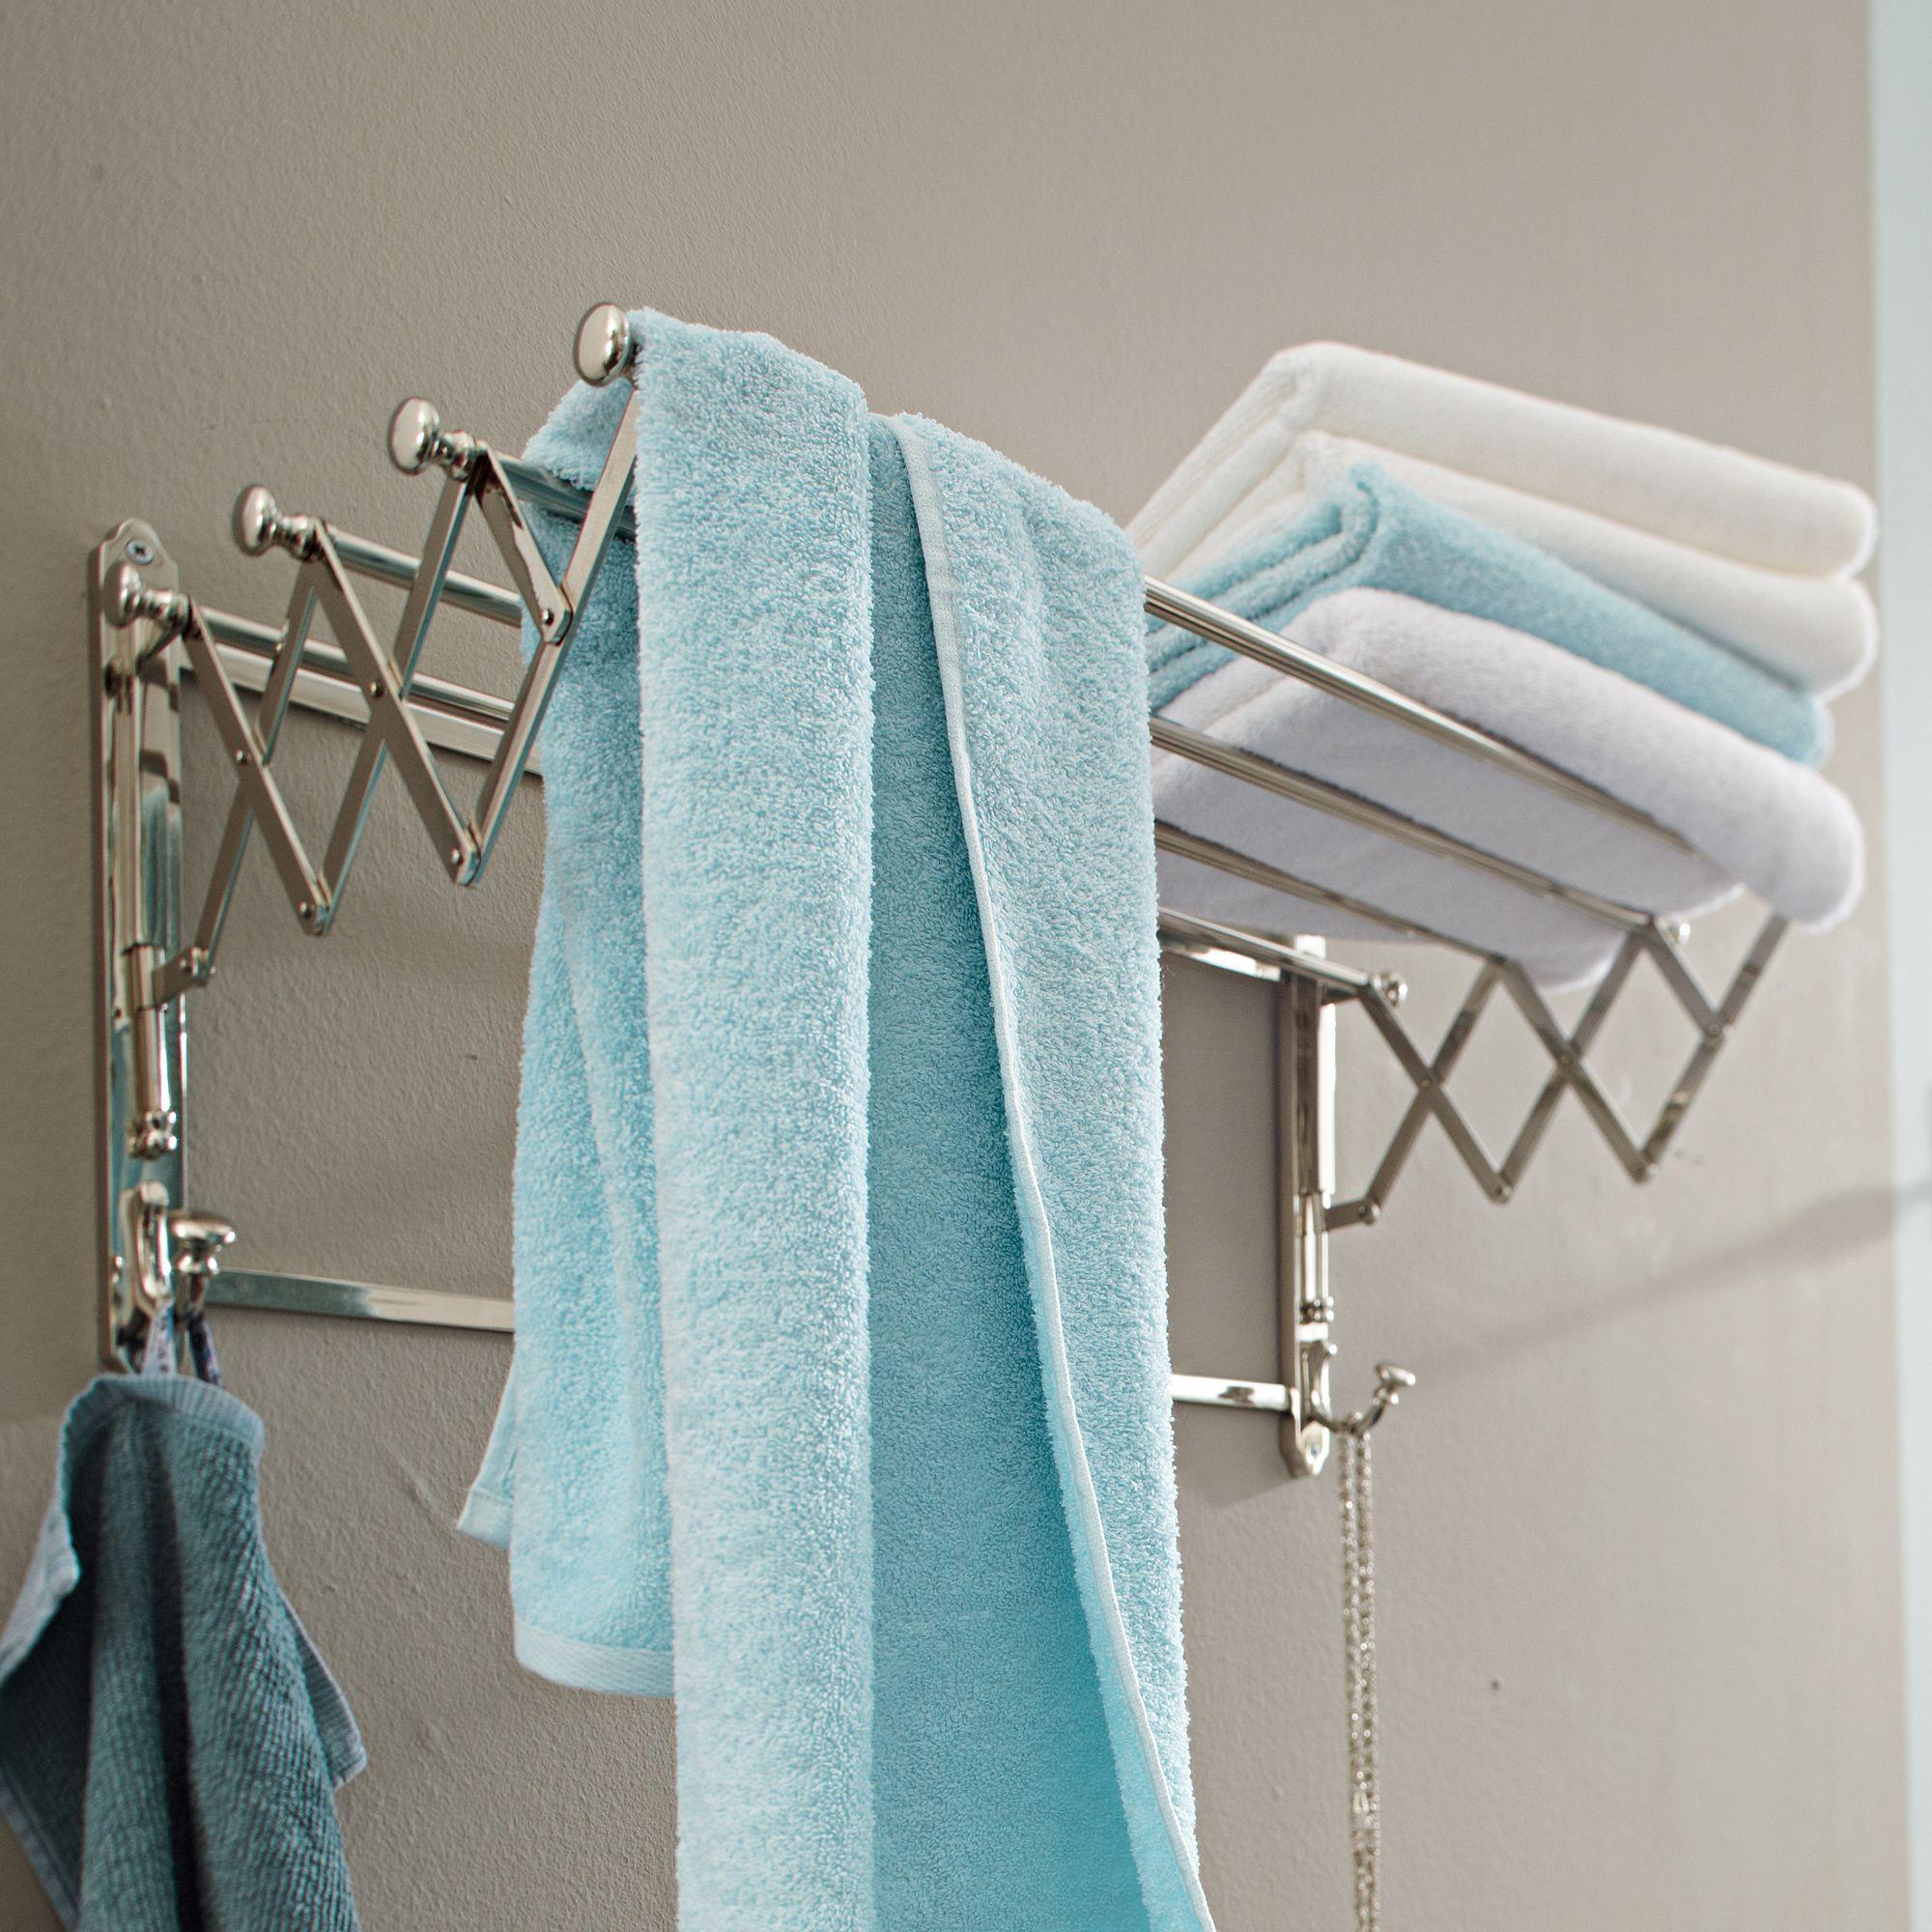 Handtuchhalter Towel Rail Impressionen Moebel Badezimmer